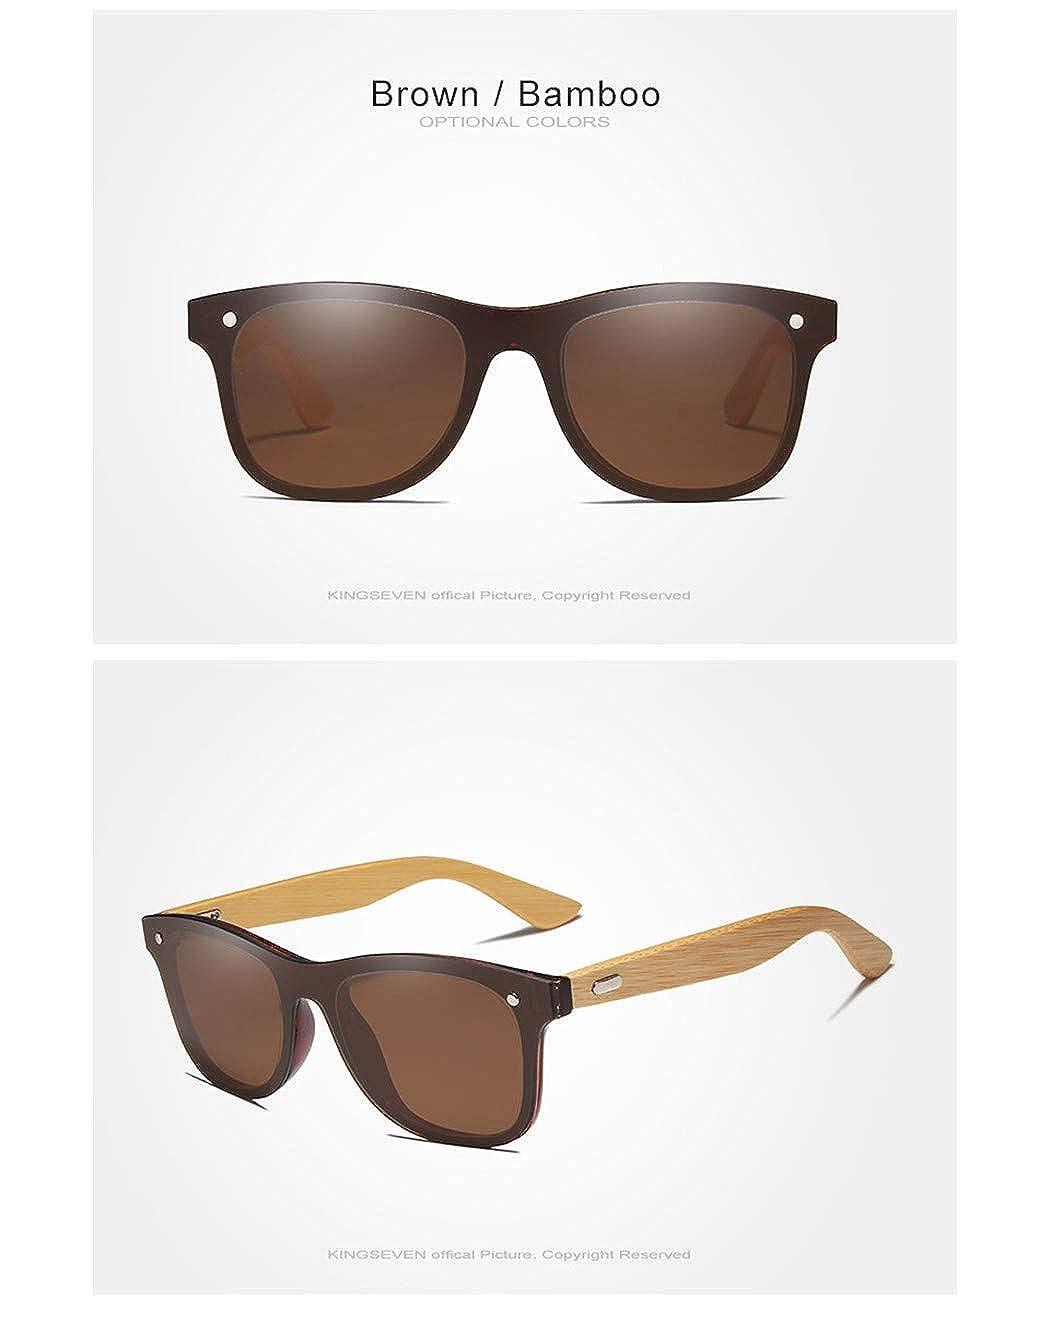 Bamboo Polarized Sunglasses Men Wooden Sun glasses Women Brand Original Wood Glasses Brown bamboo